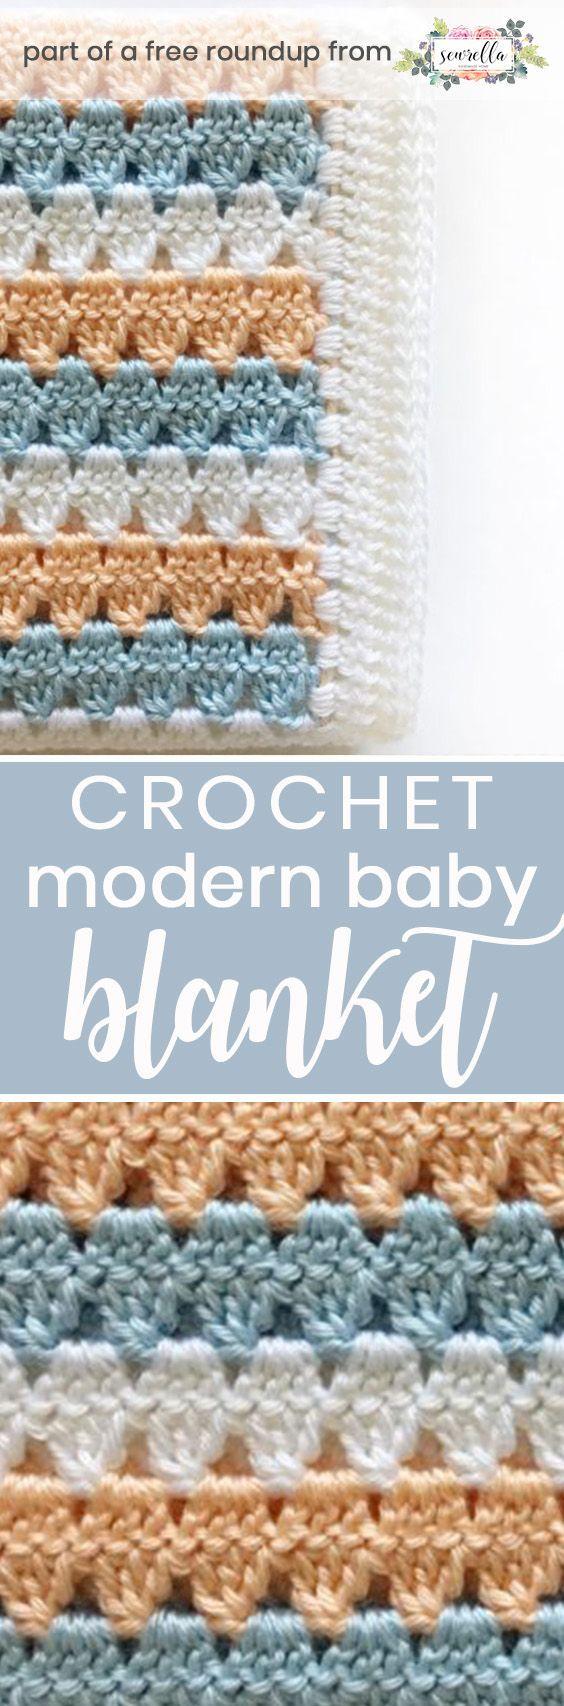 Gender Neutral Crochet Baby Blanket Roundup | Häckelmuster, Baby ...